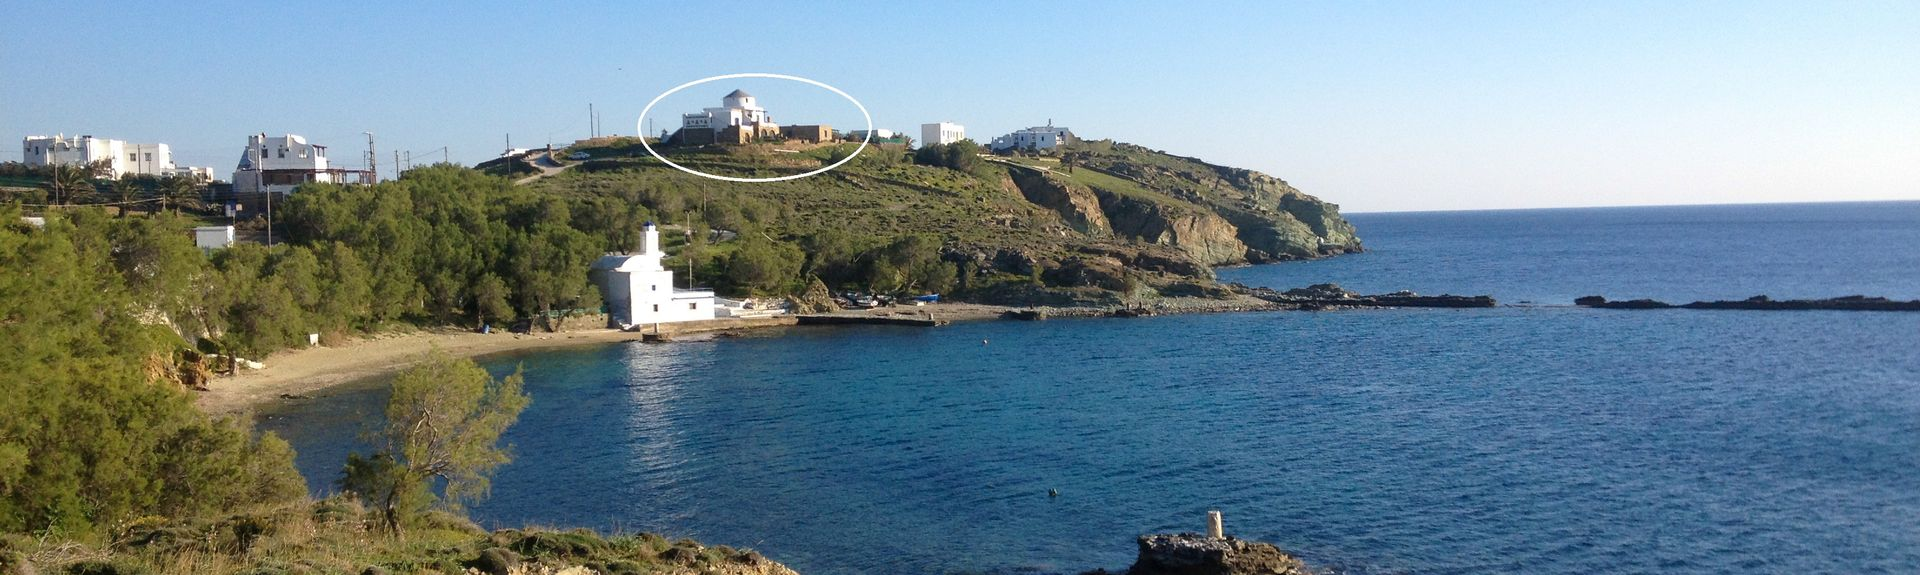 Elia Beach, Mykonos, South Aegean, Greece